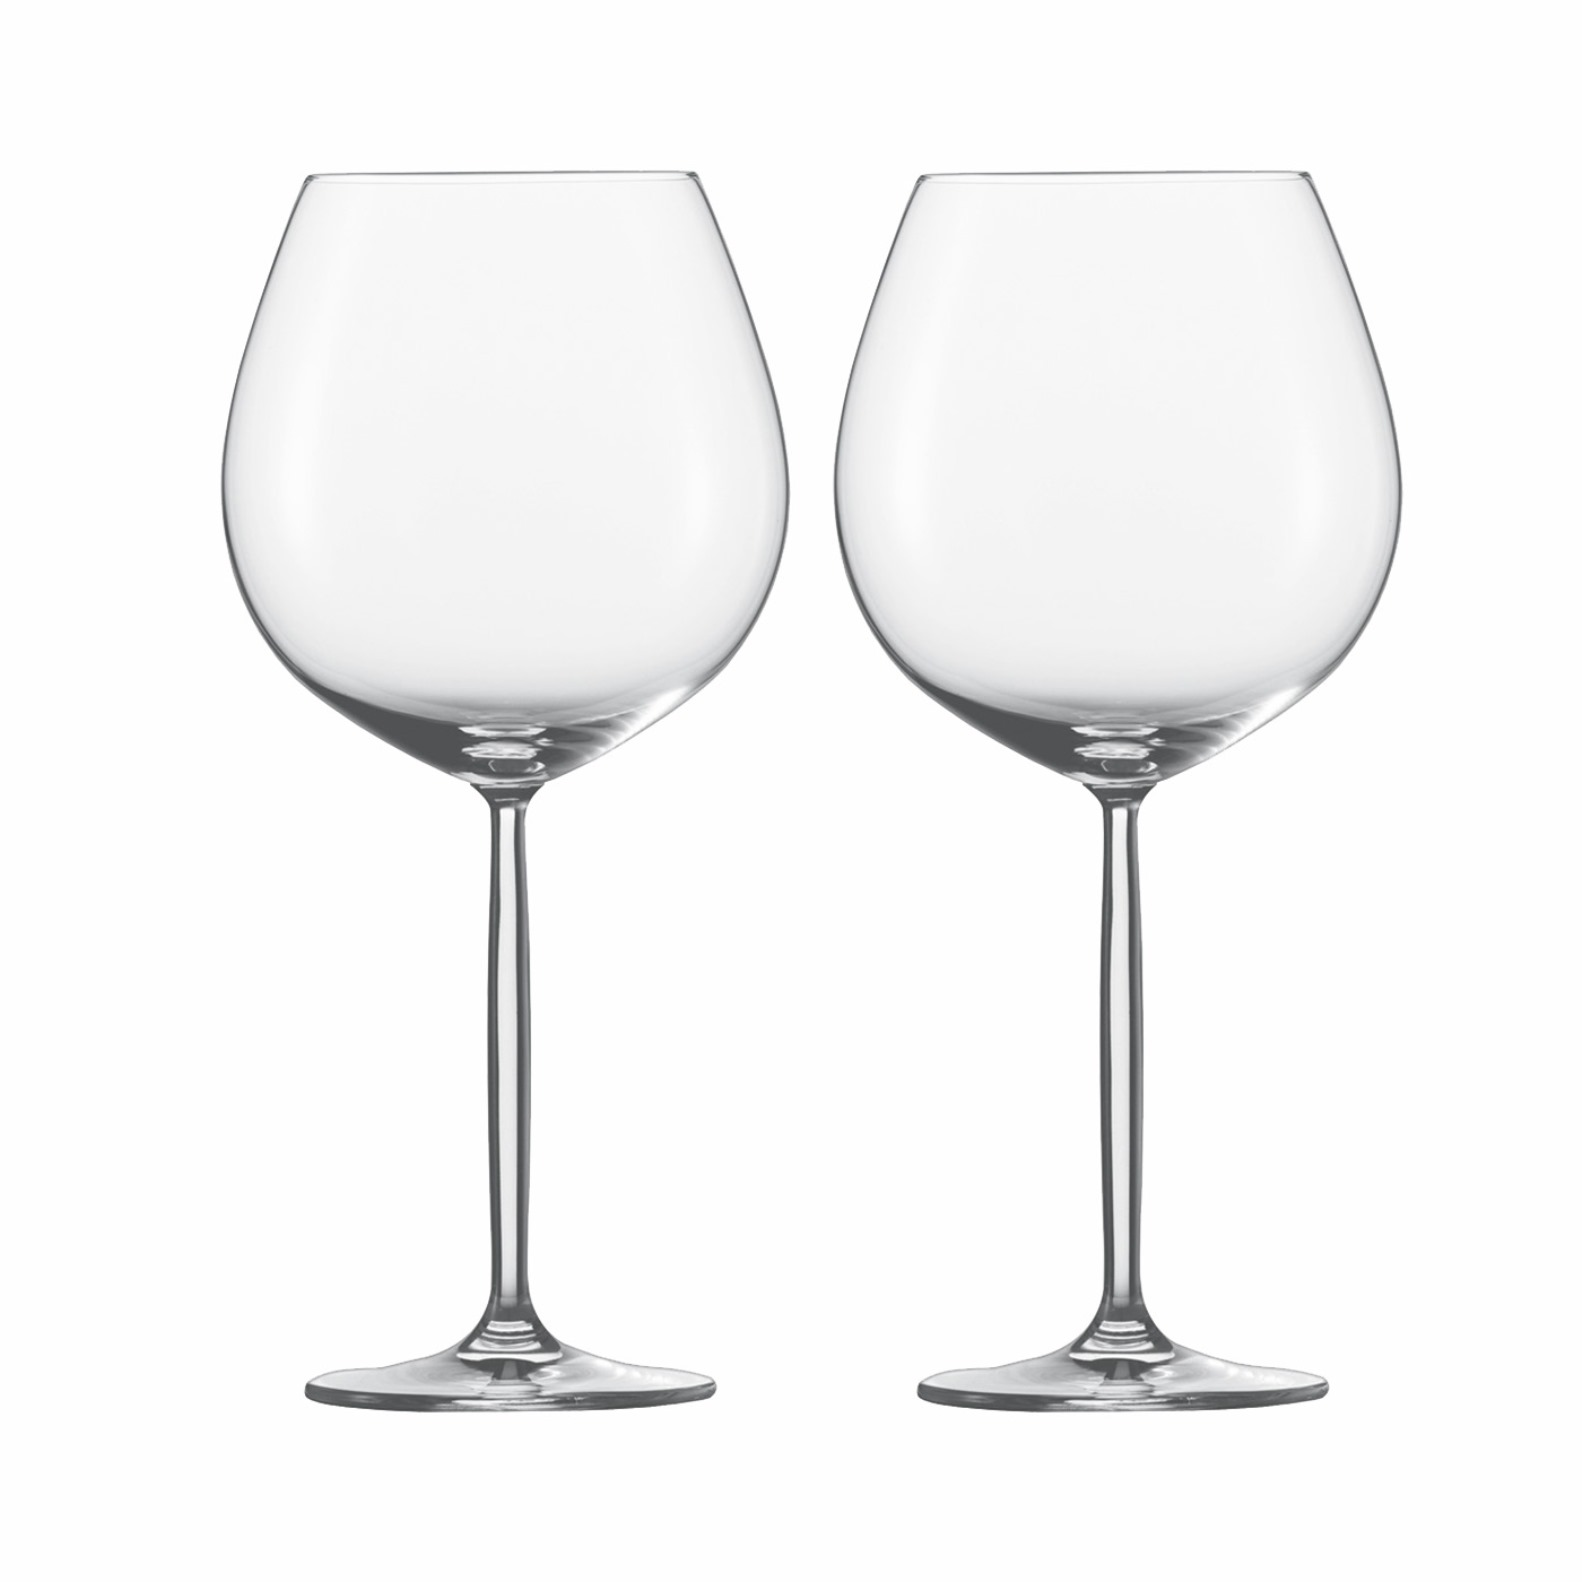 Онлайн каталог PROMENU: Набор бокалов для красного вина Burgundy Schott Zwiesel DIVA PROMO, объем 0,839 л, прозрачный, 2 штуки                               121207